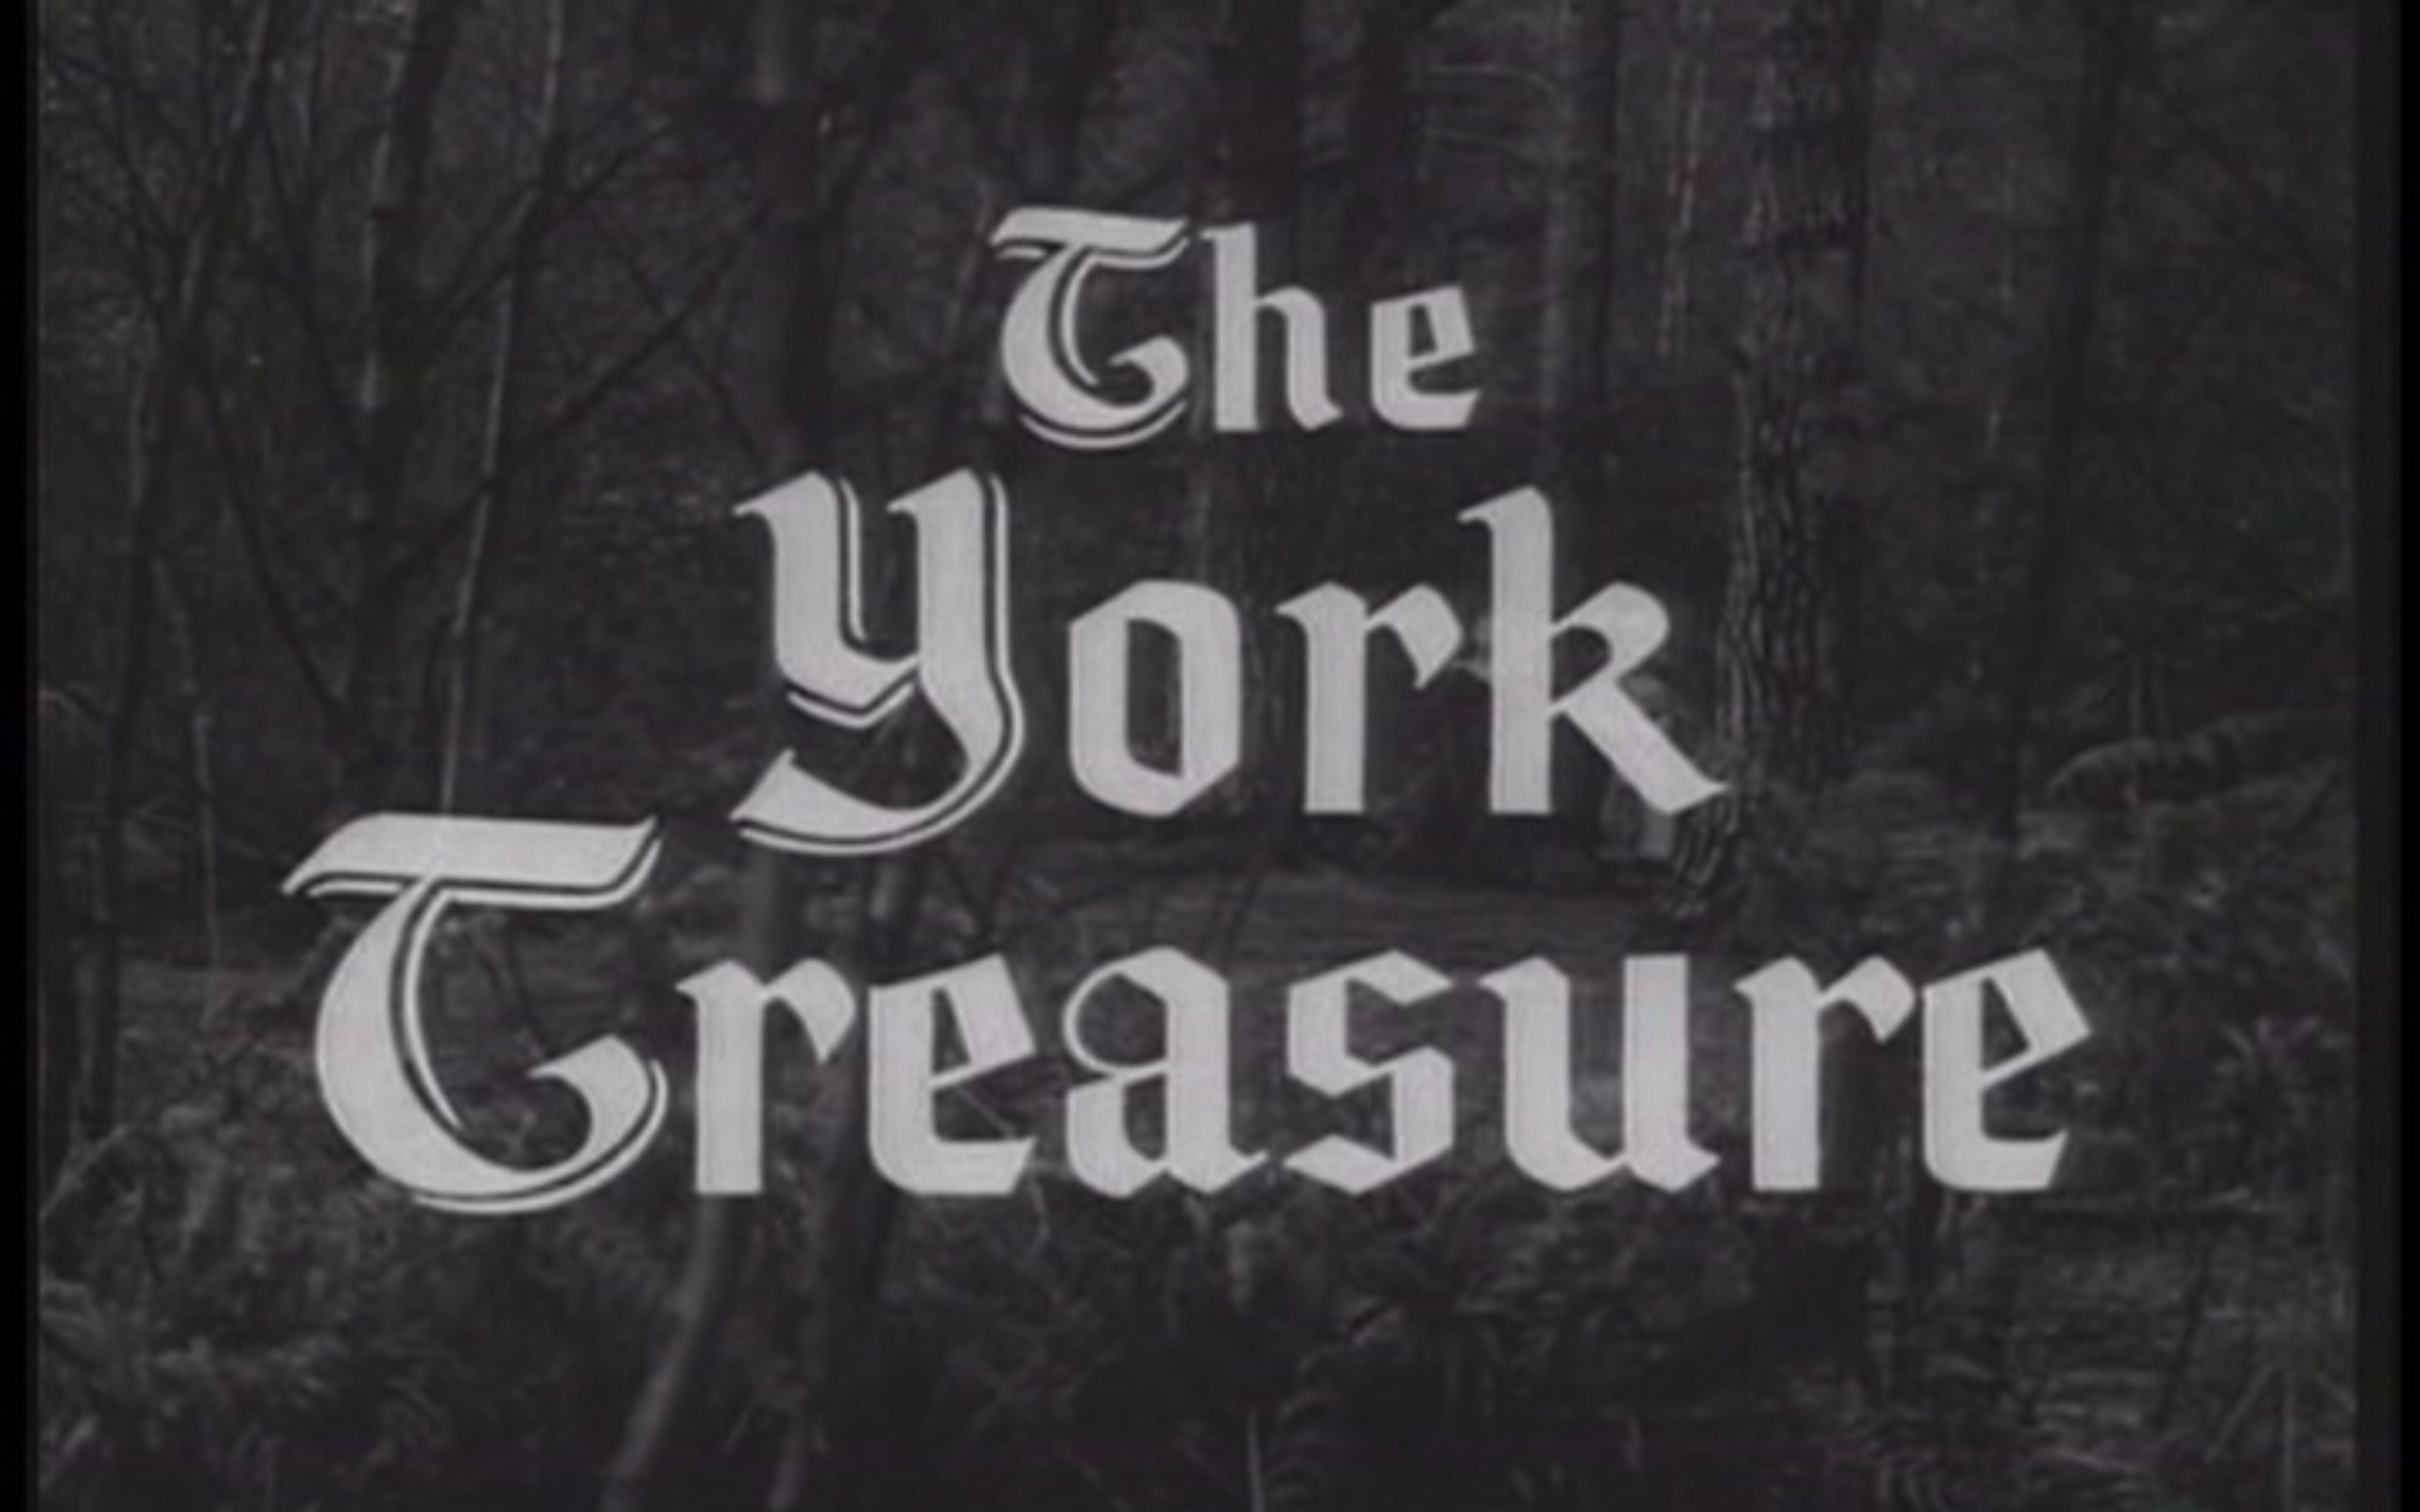 Robin Hood_The York Treasure Title Card